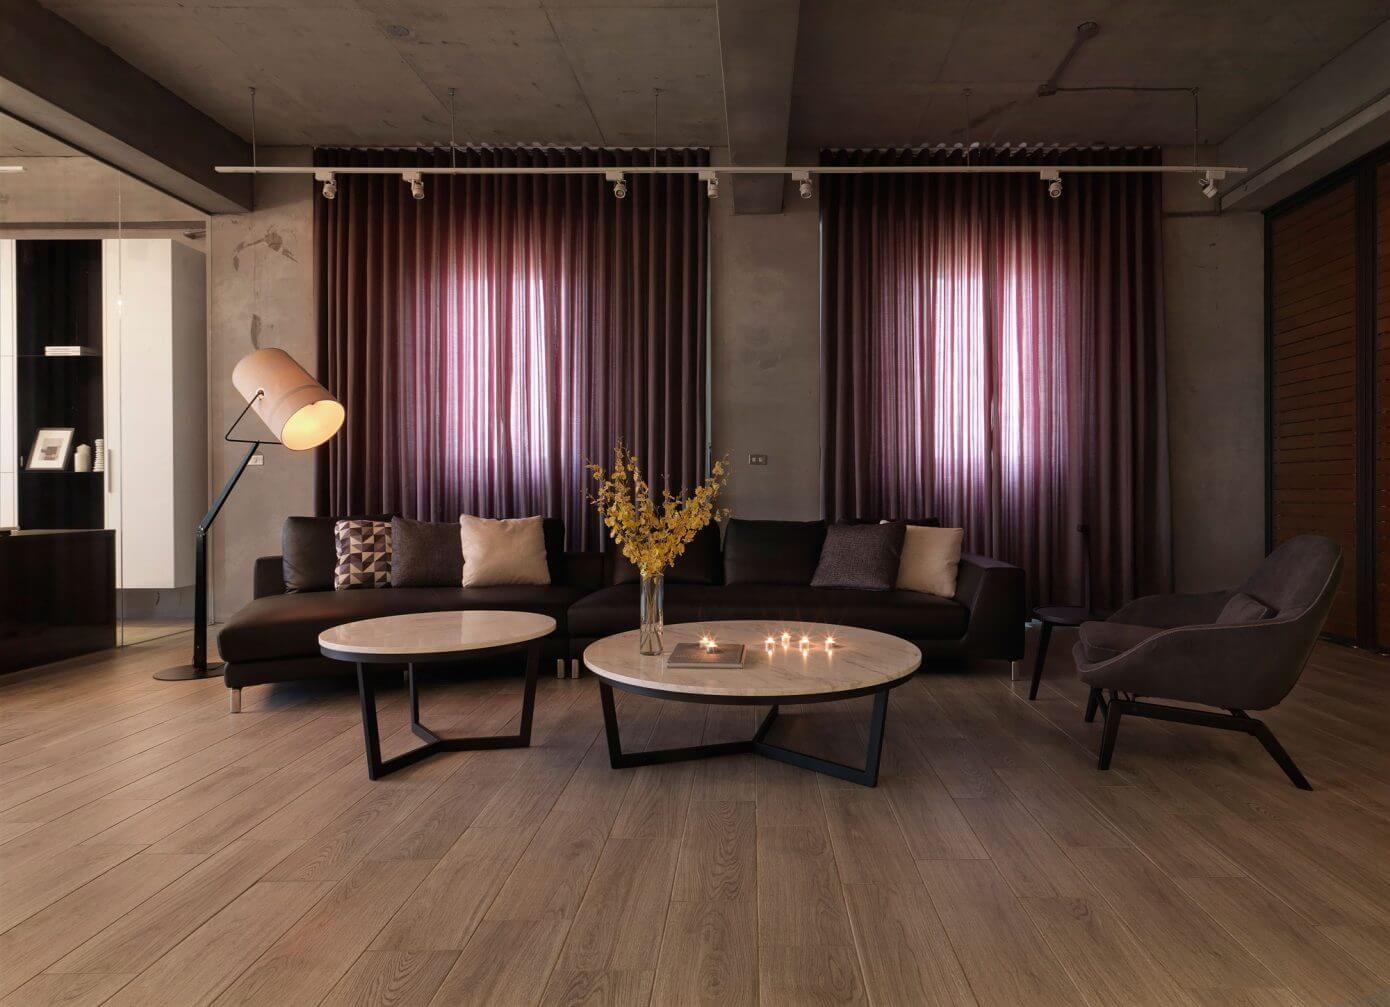 Home in Taiwan by MORI Design | HomeAdore #InteriorDesign ...